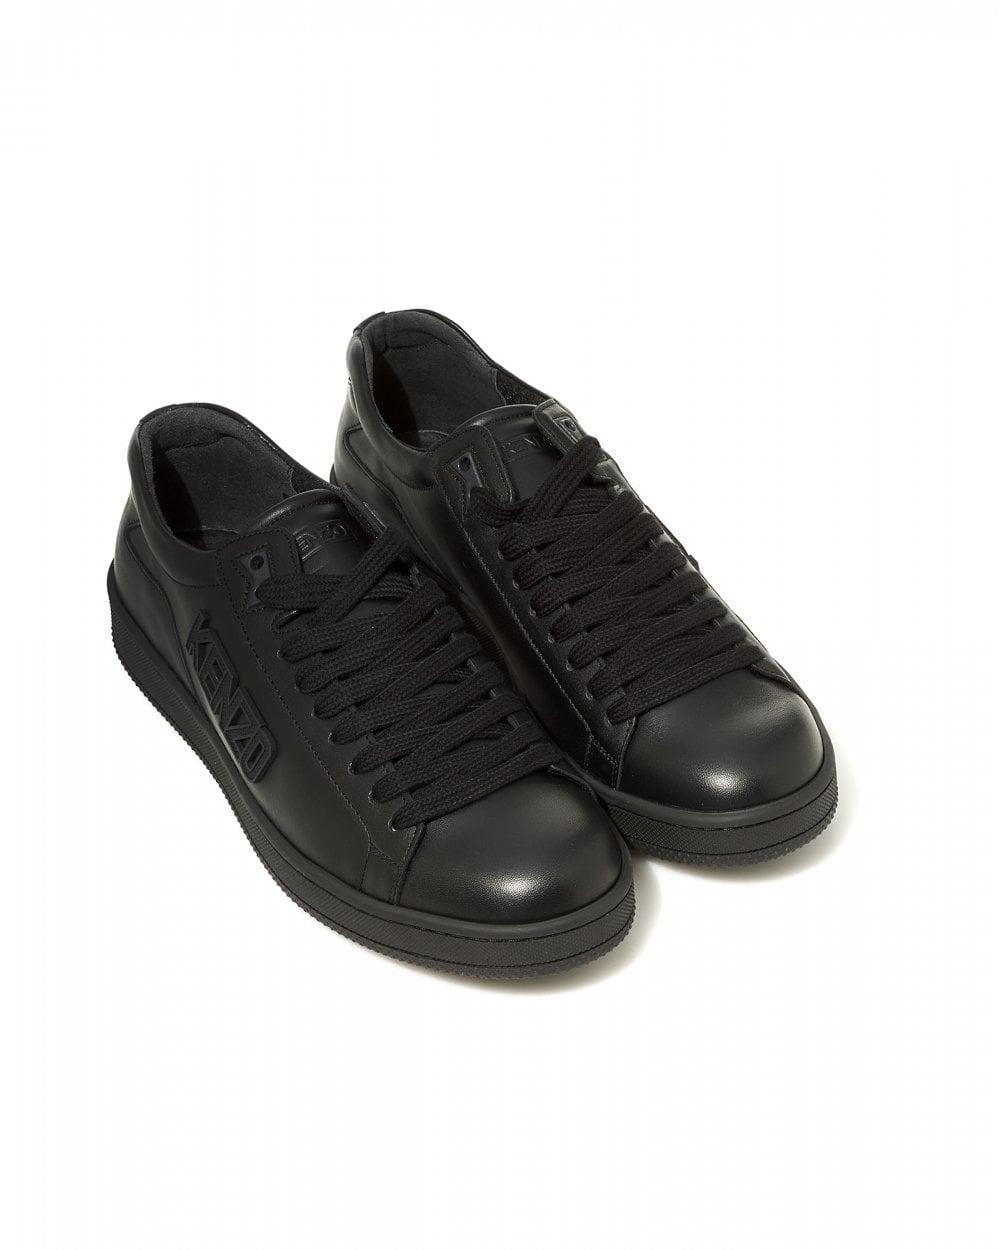 Top Tennix Trainers, Black Logo Sneakers